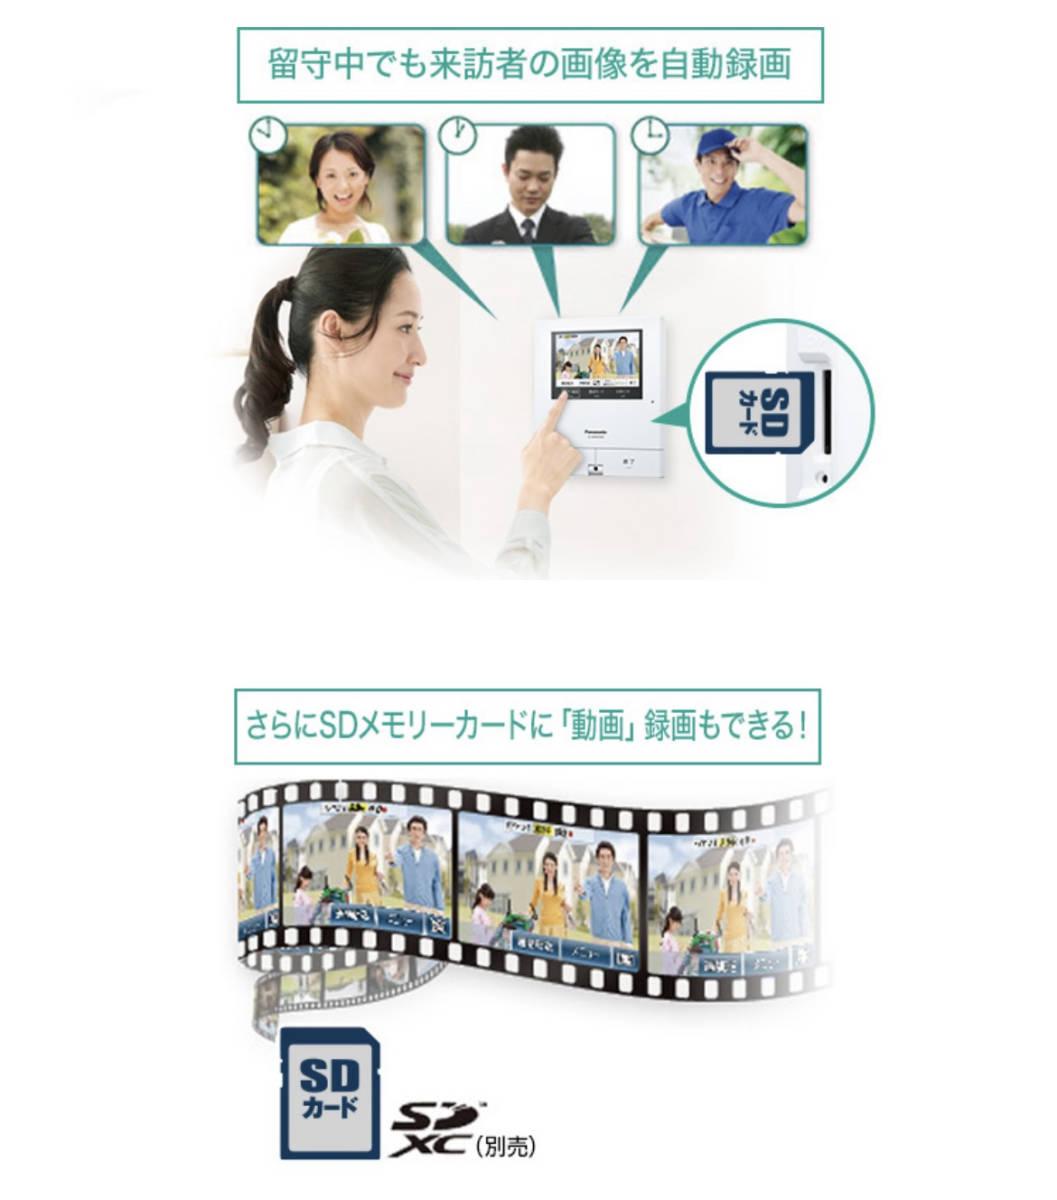 ★VL-SWH505KF★とカラーカメラ玄関子機 VL-VD561L-N Panasonic大画面テレビワイヤレスモニタースマホで来客応対可能 パナソニック_画像3